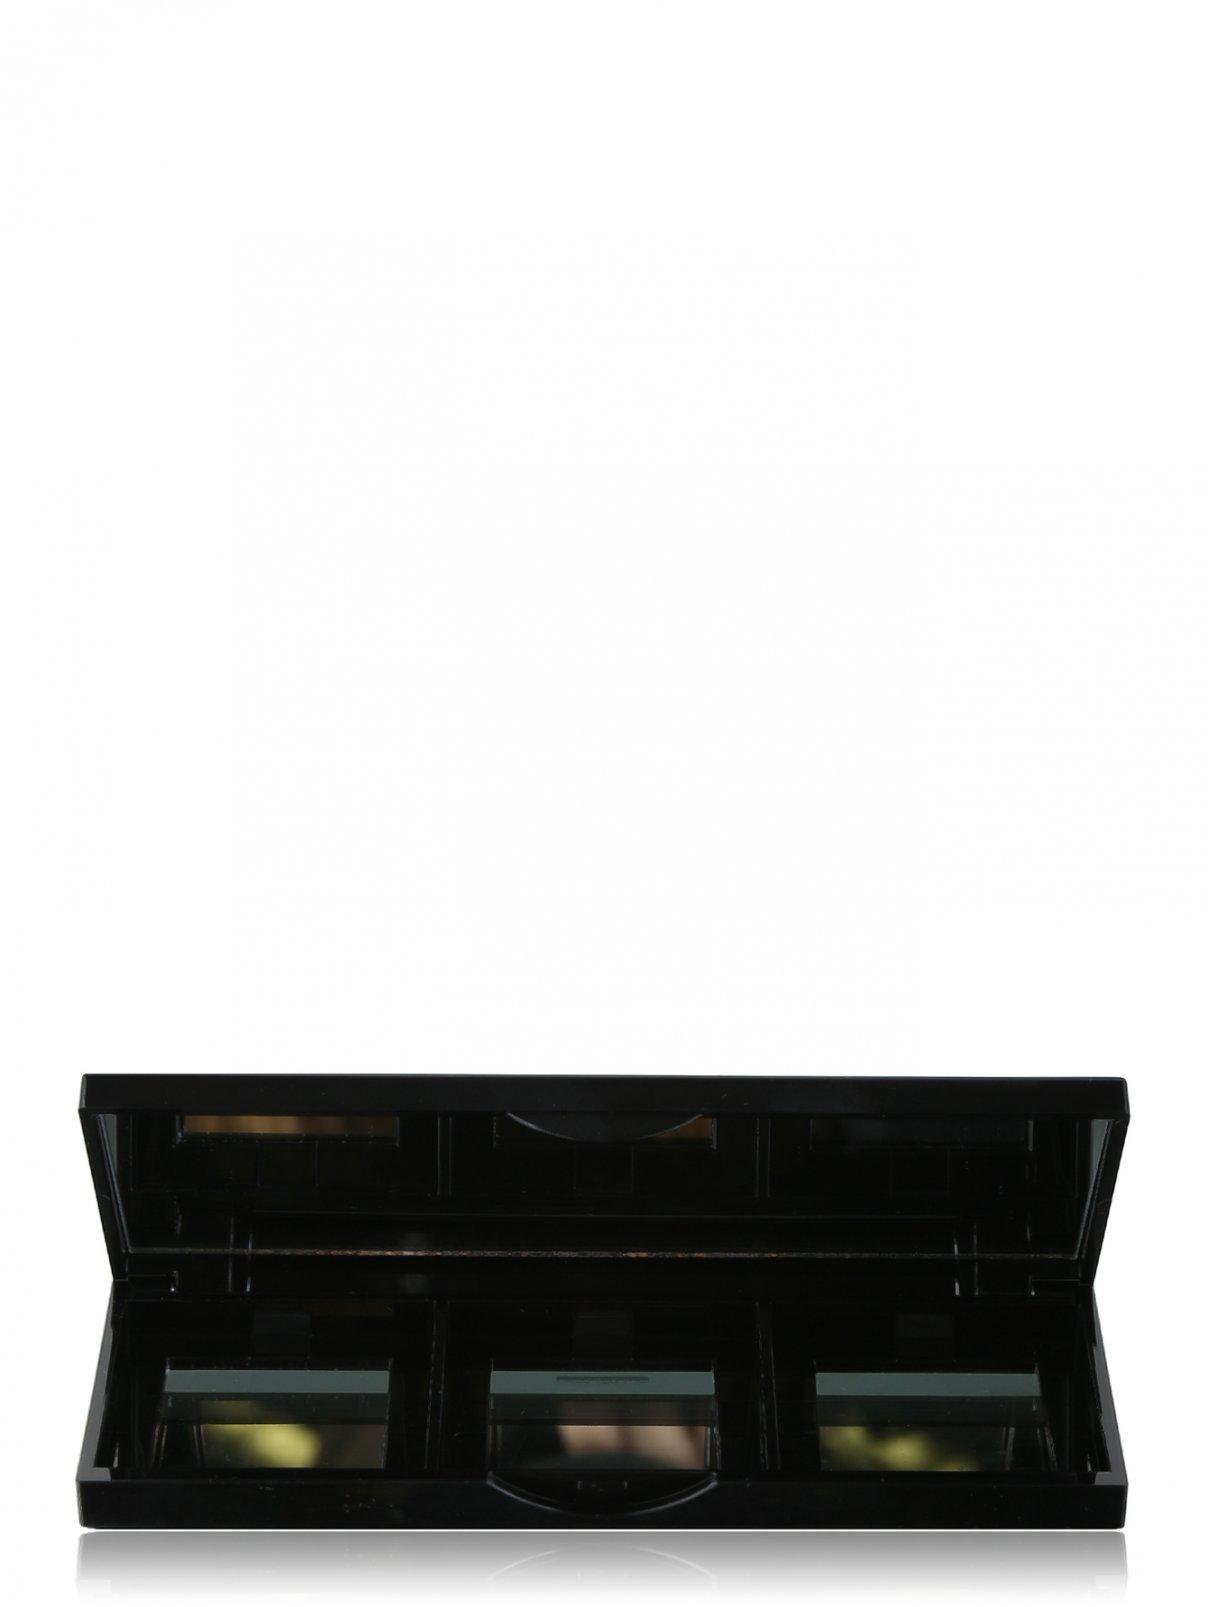 Палетка пустая на 3 оттенка 3Pan Customizable Pale Customizable Palette Bobbi Brown  –  Общий вид